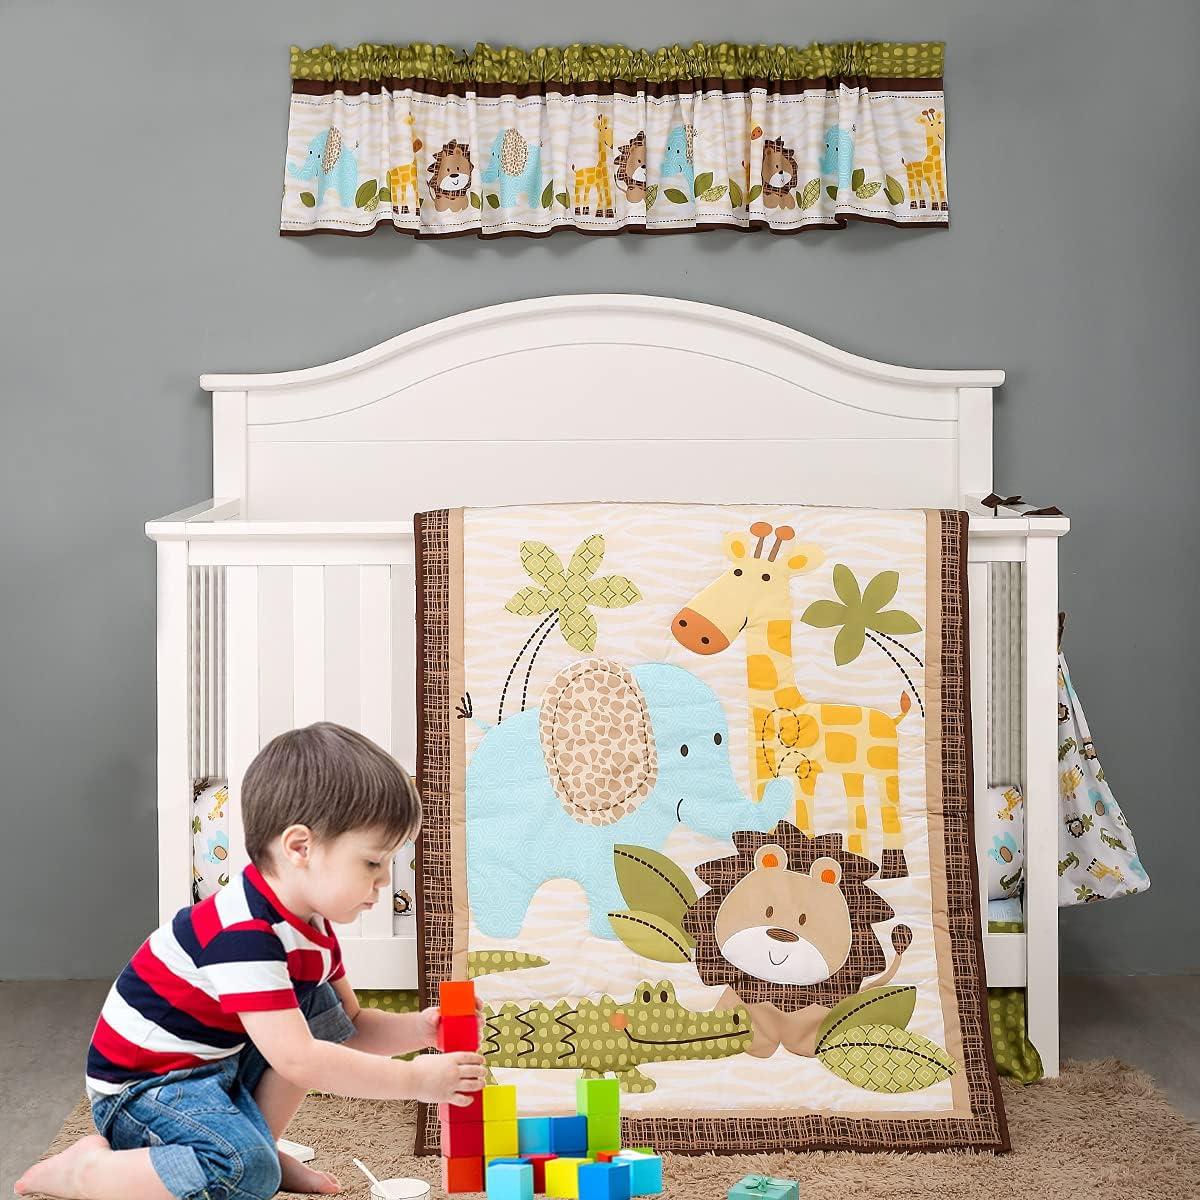 Brandream Jungle Elephant Baby Boys Nursery and Ranking TOP4 Girl Max 47% OFF Beddin Crib